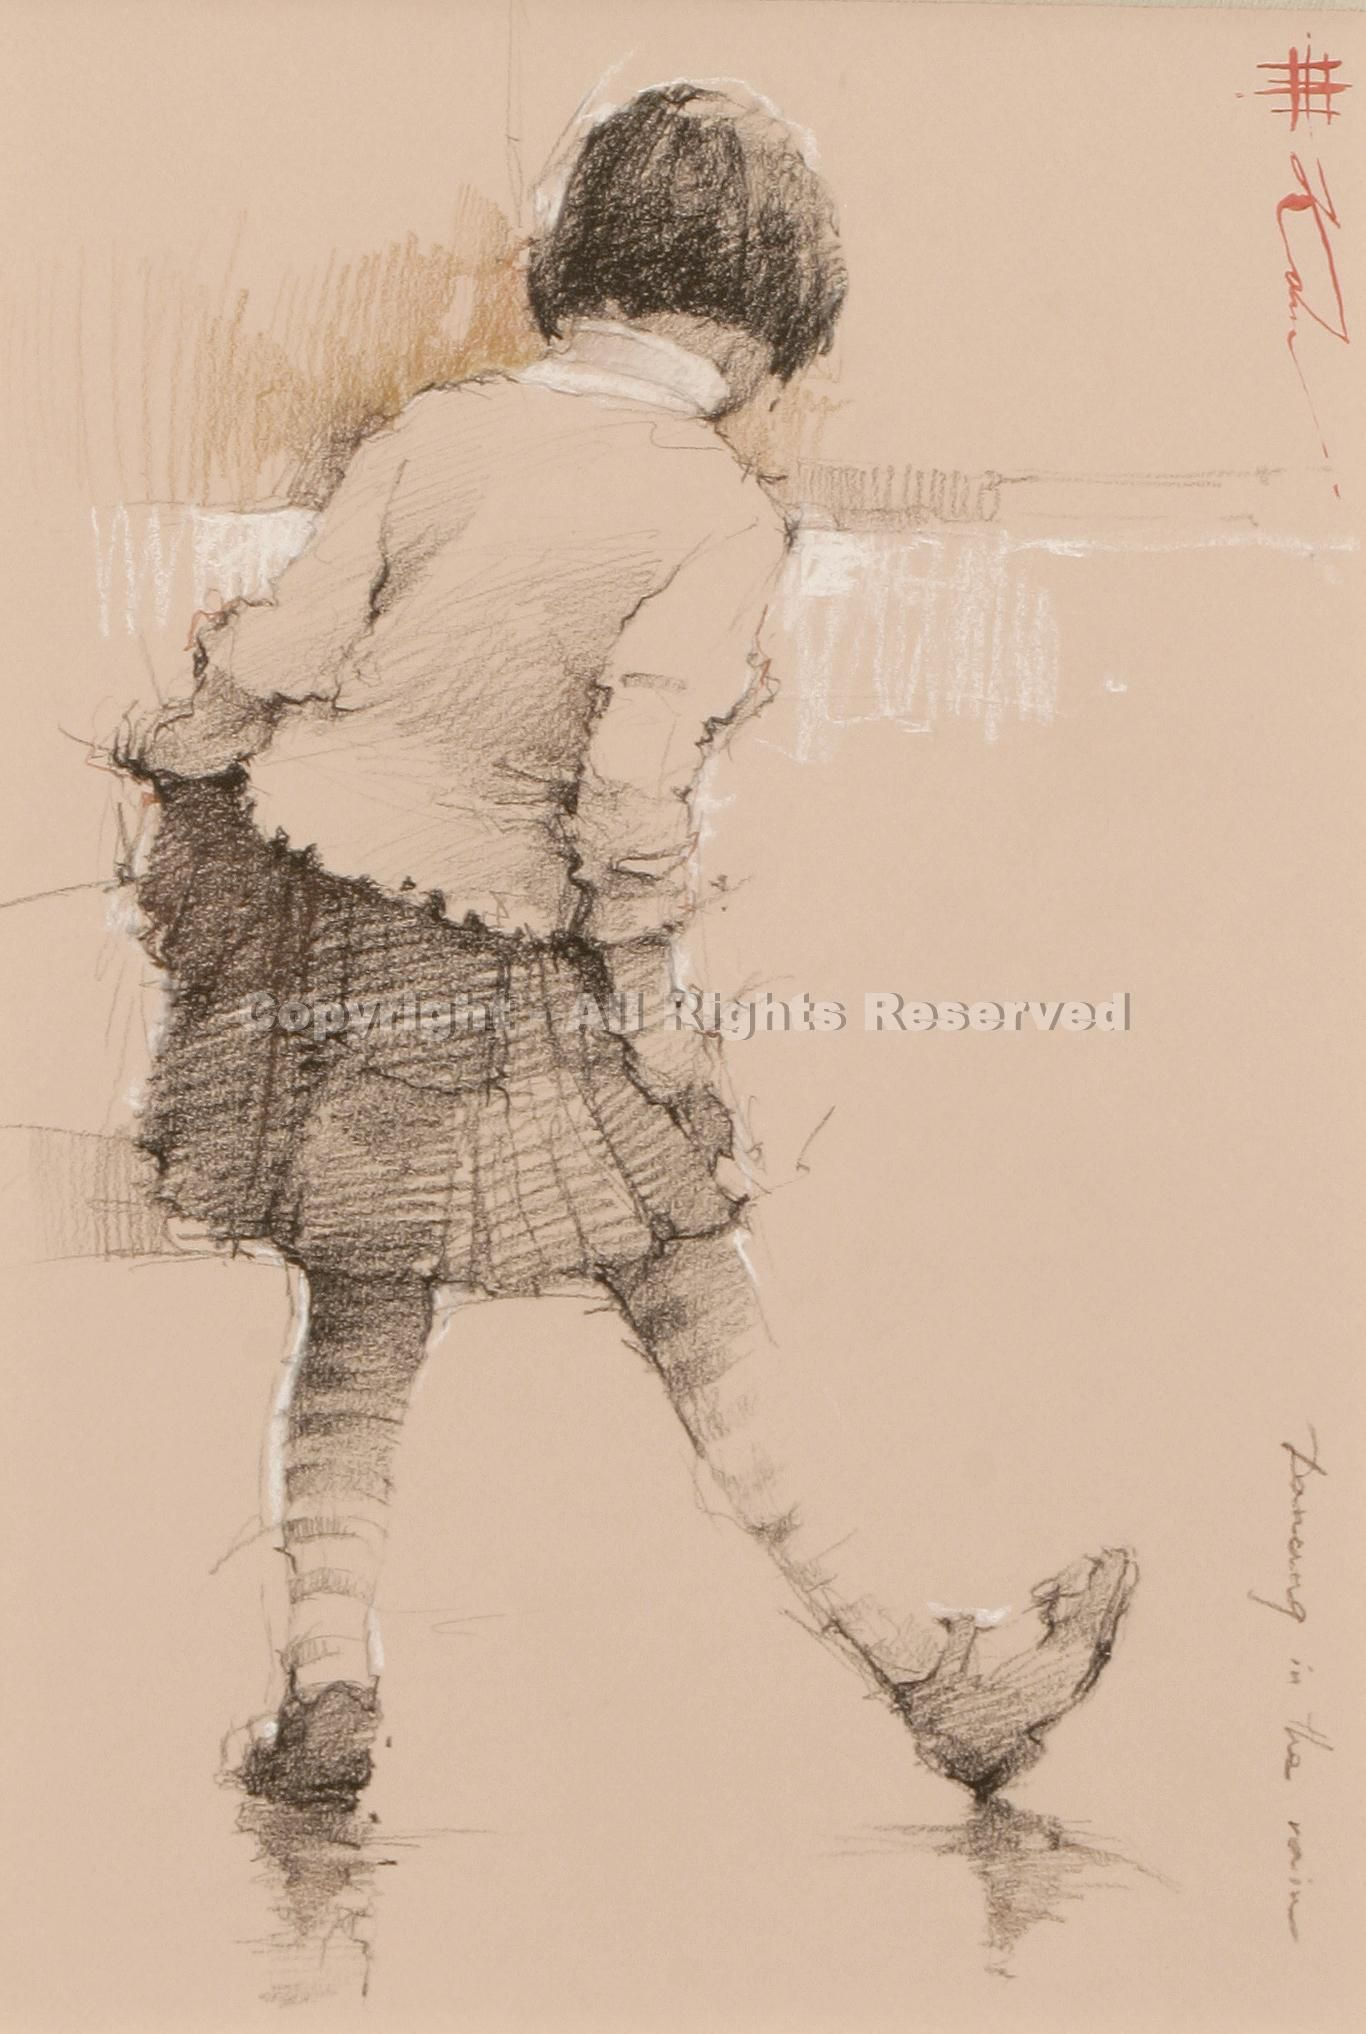 Dancing in the Rain by Andre Kohn - Greenhouse Fine Art - San Antonio, TX